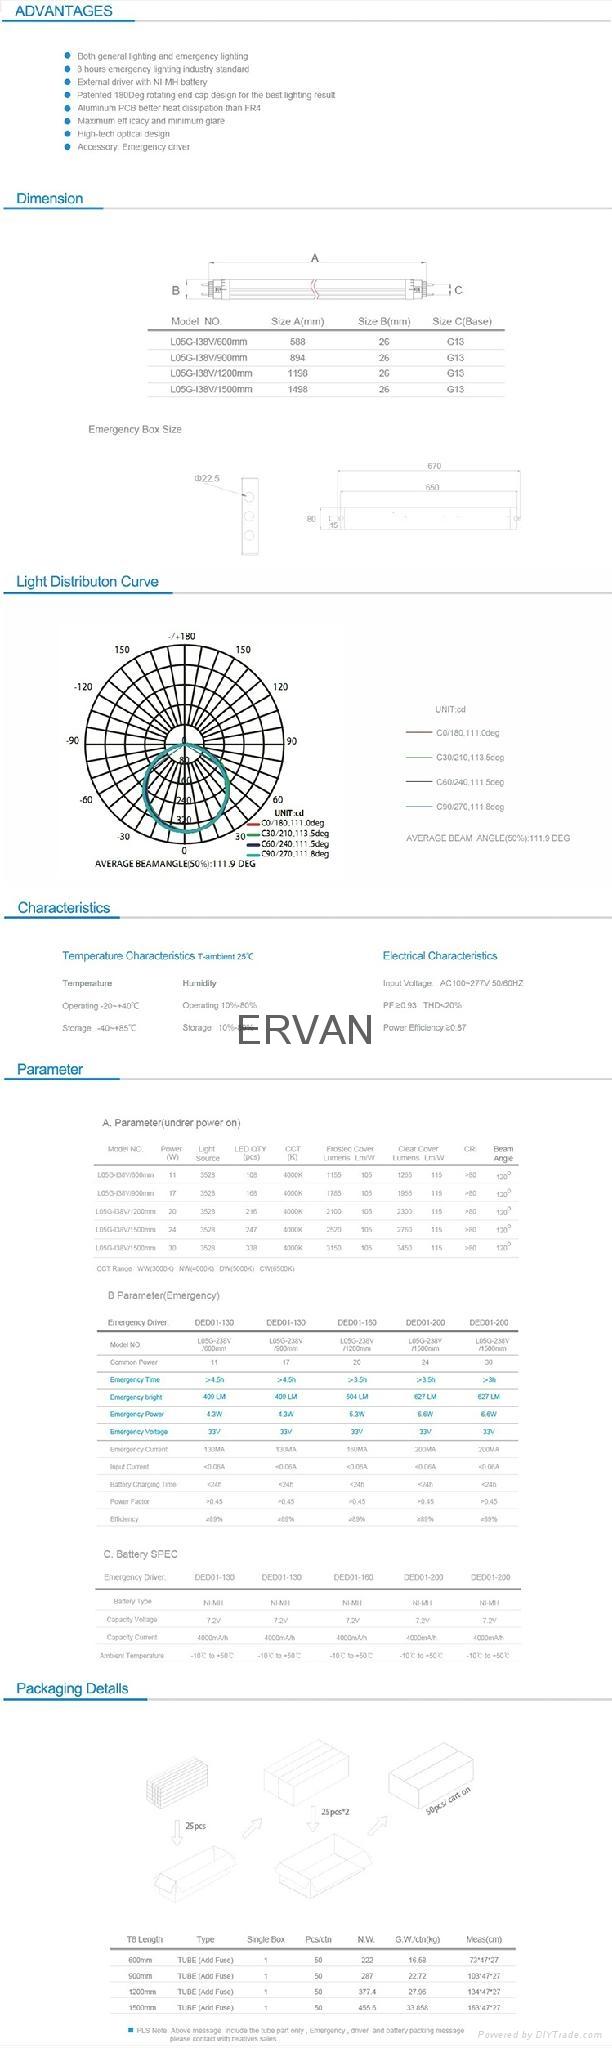 ERVAN TUV  600MM 9W LED emergency lights 14